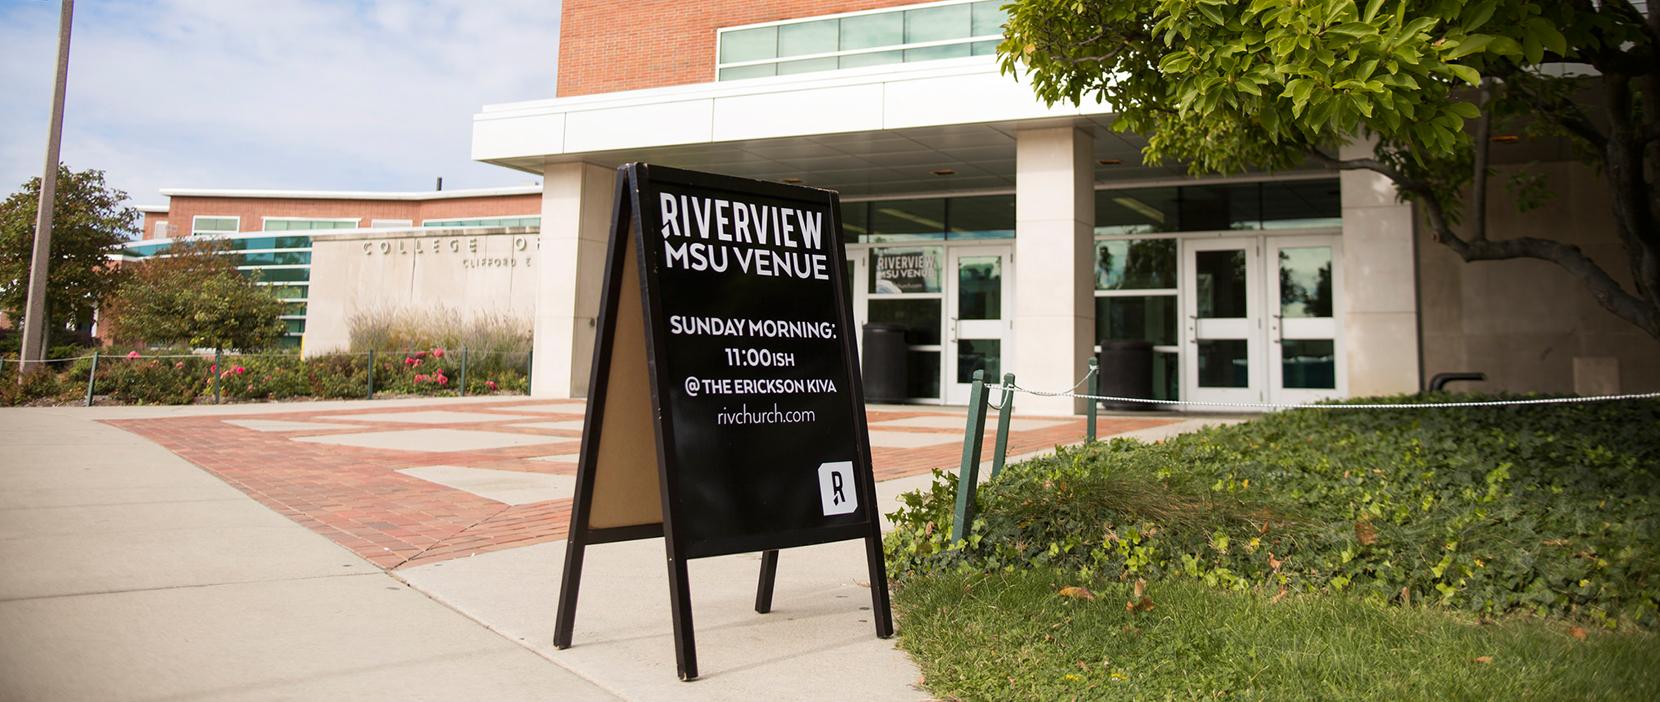 Featured Image for Riv's MSU Venue